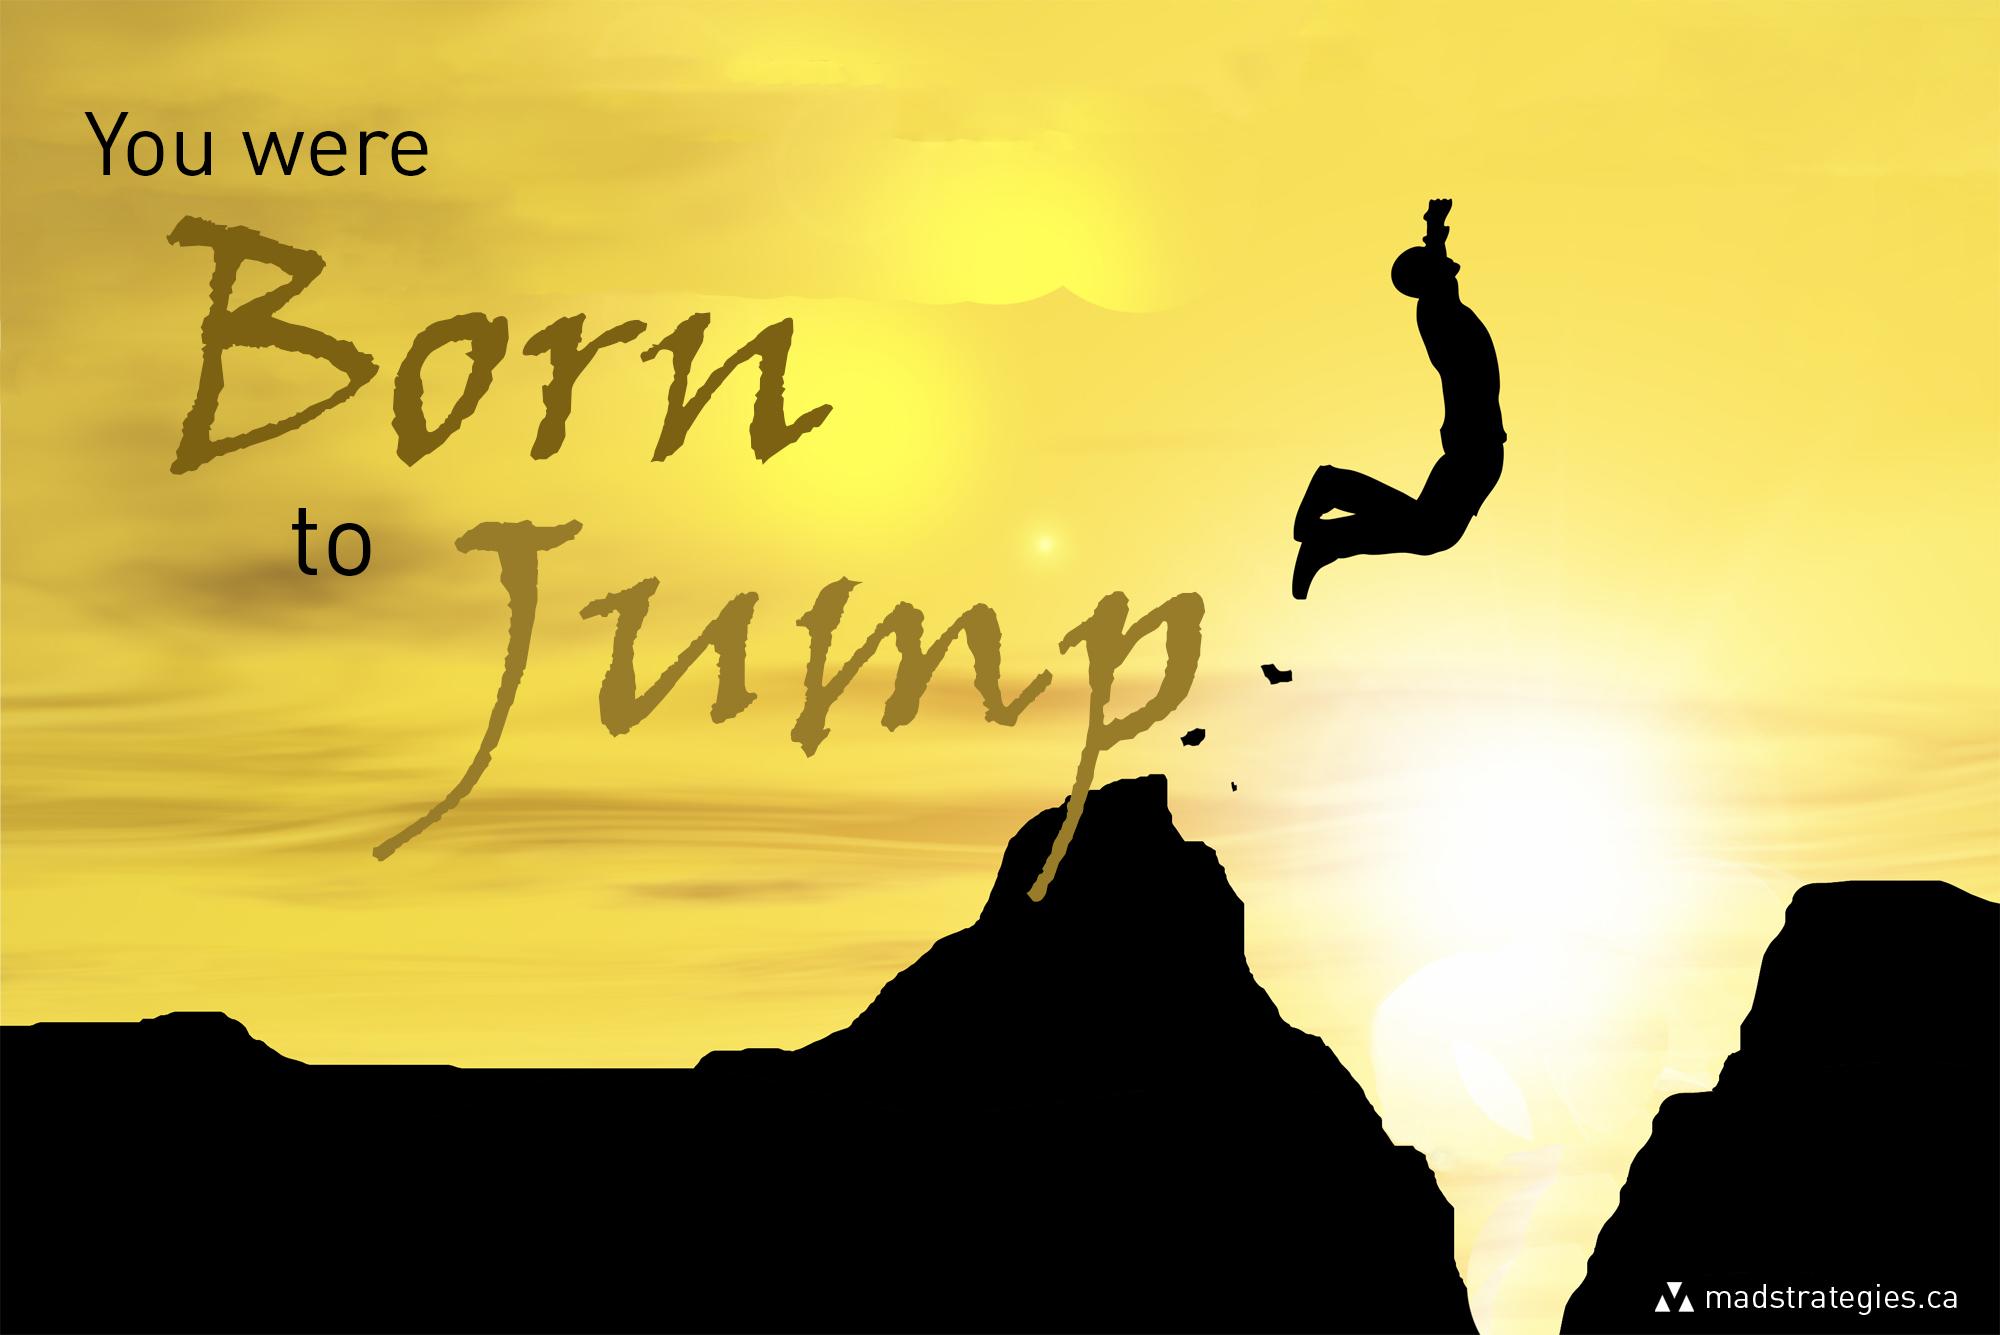 Human man silhouette jumping at sunset banner